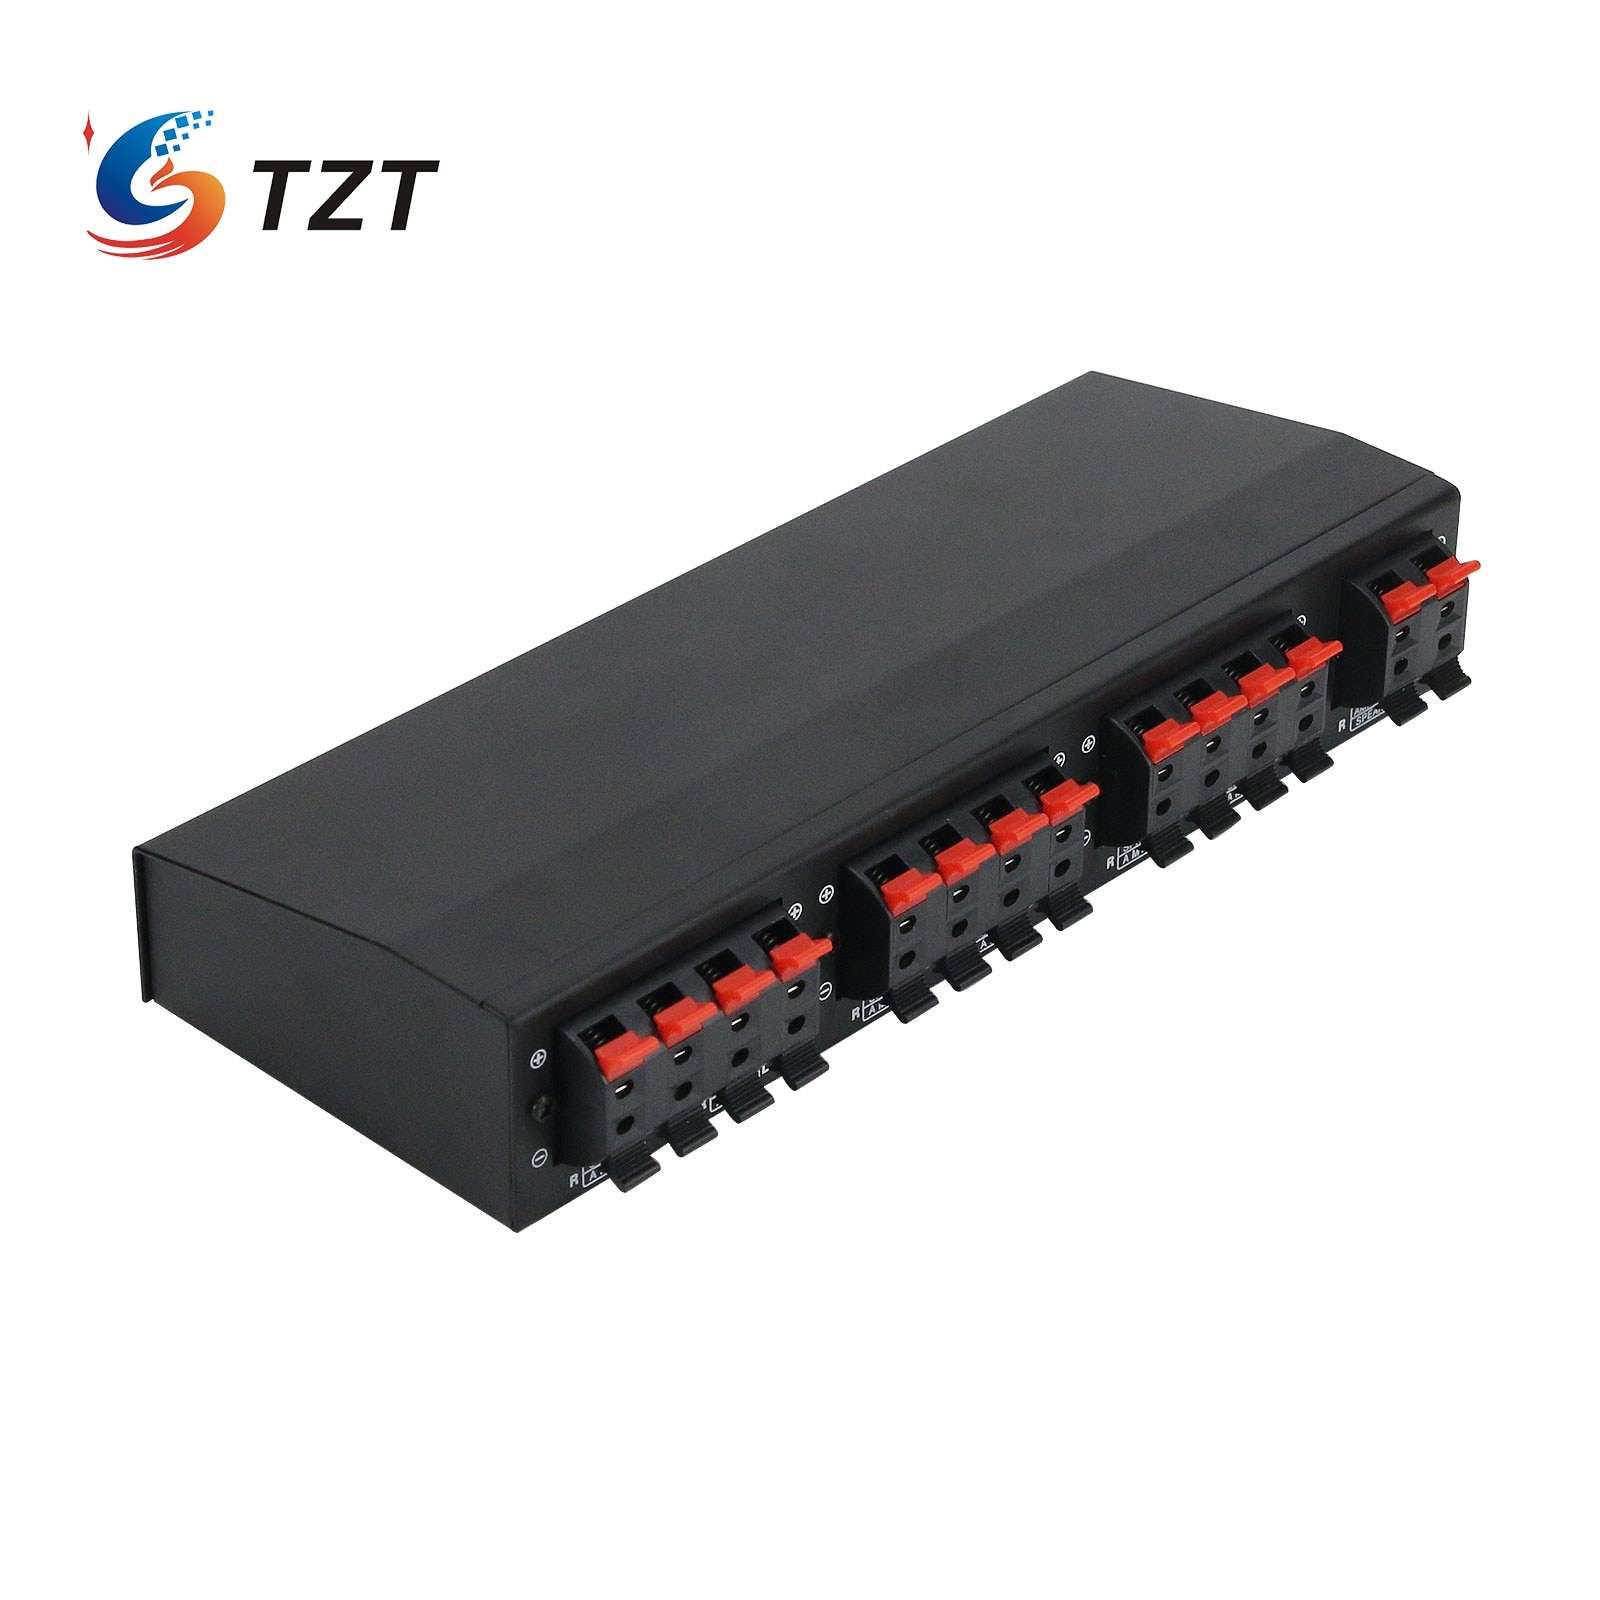 TZT-مفتاح اختيار مكبر صوت ستيريو سداسي الاتجاهات ، مفتاح اختيار B898 ، ثنائي الاتجاه